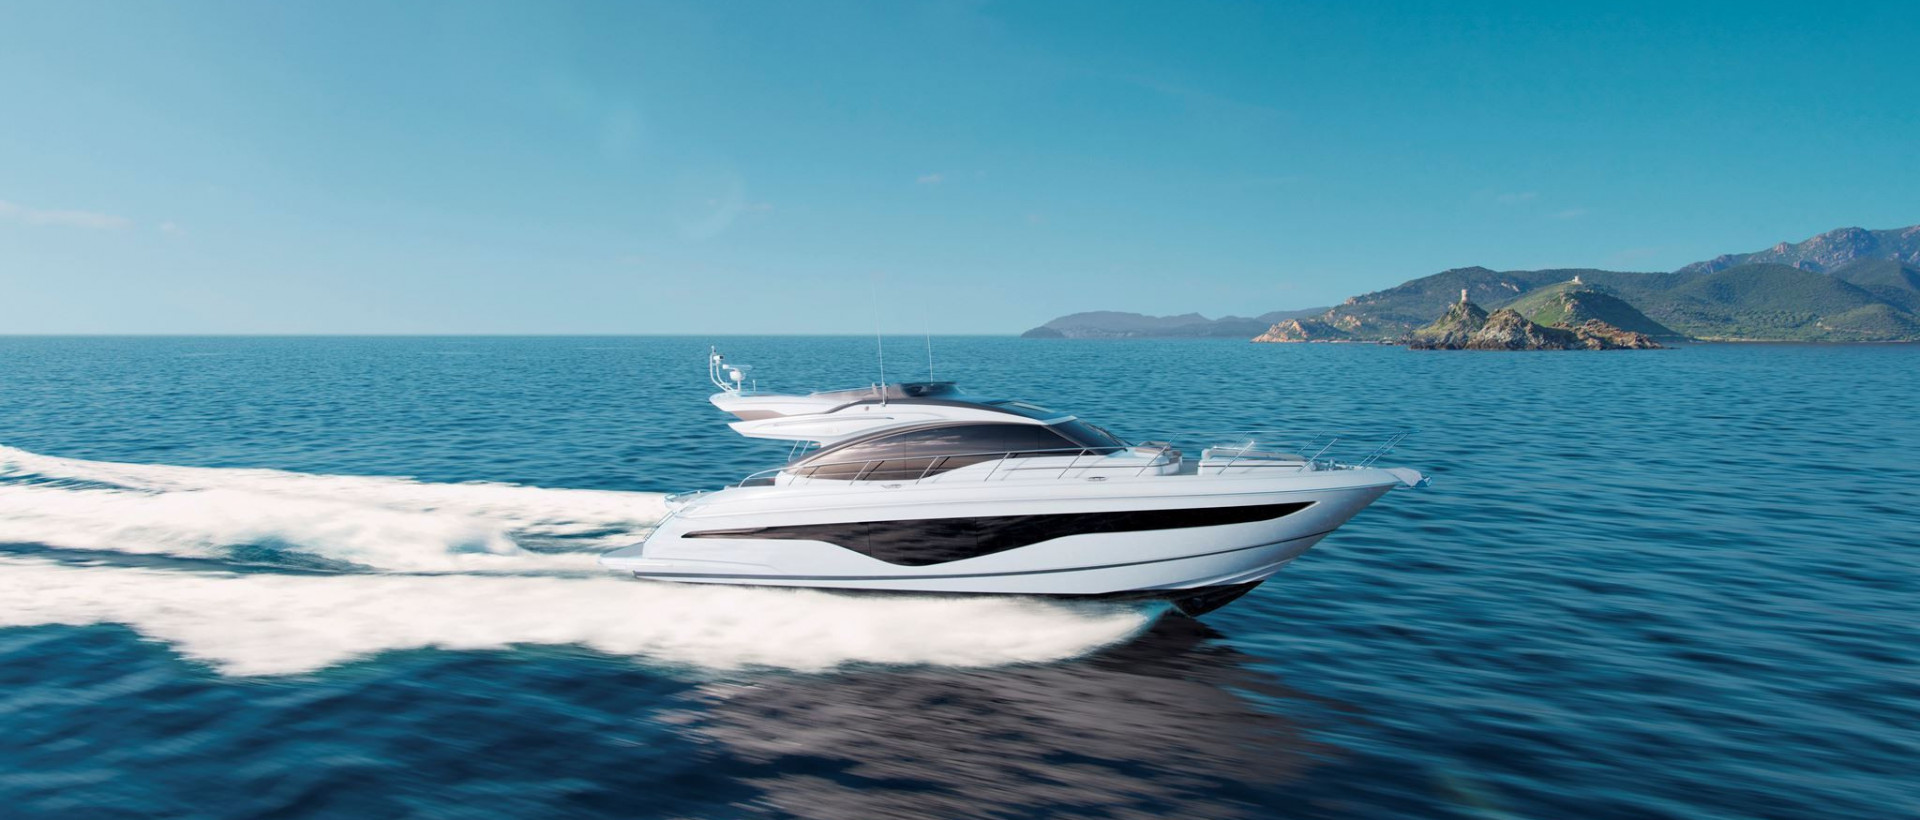 https://www.princess.fr/yacht/47/princess-s62